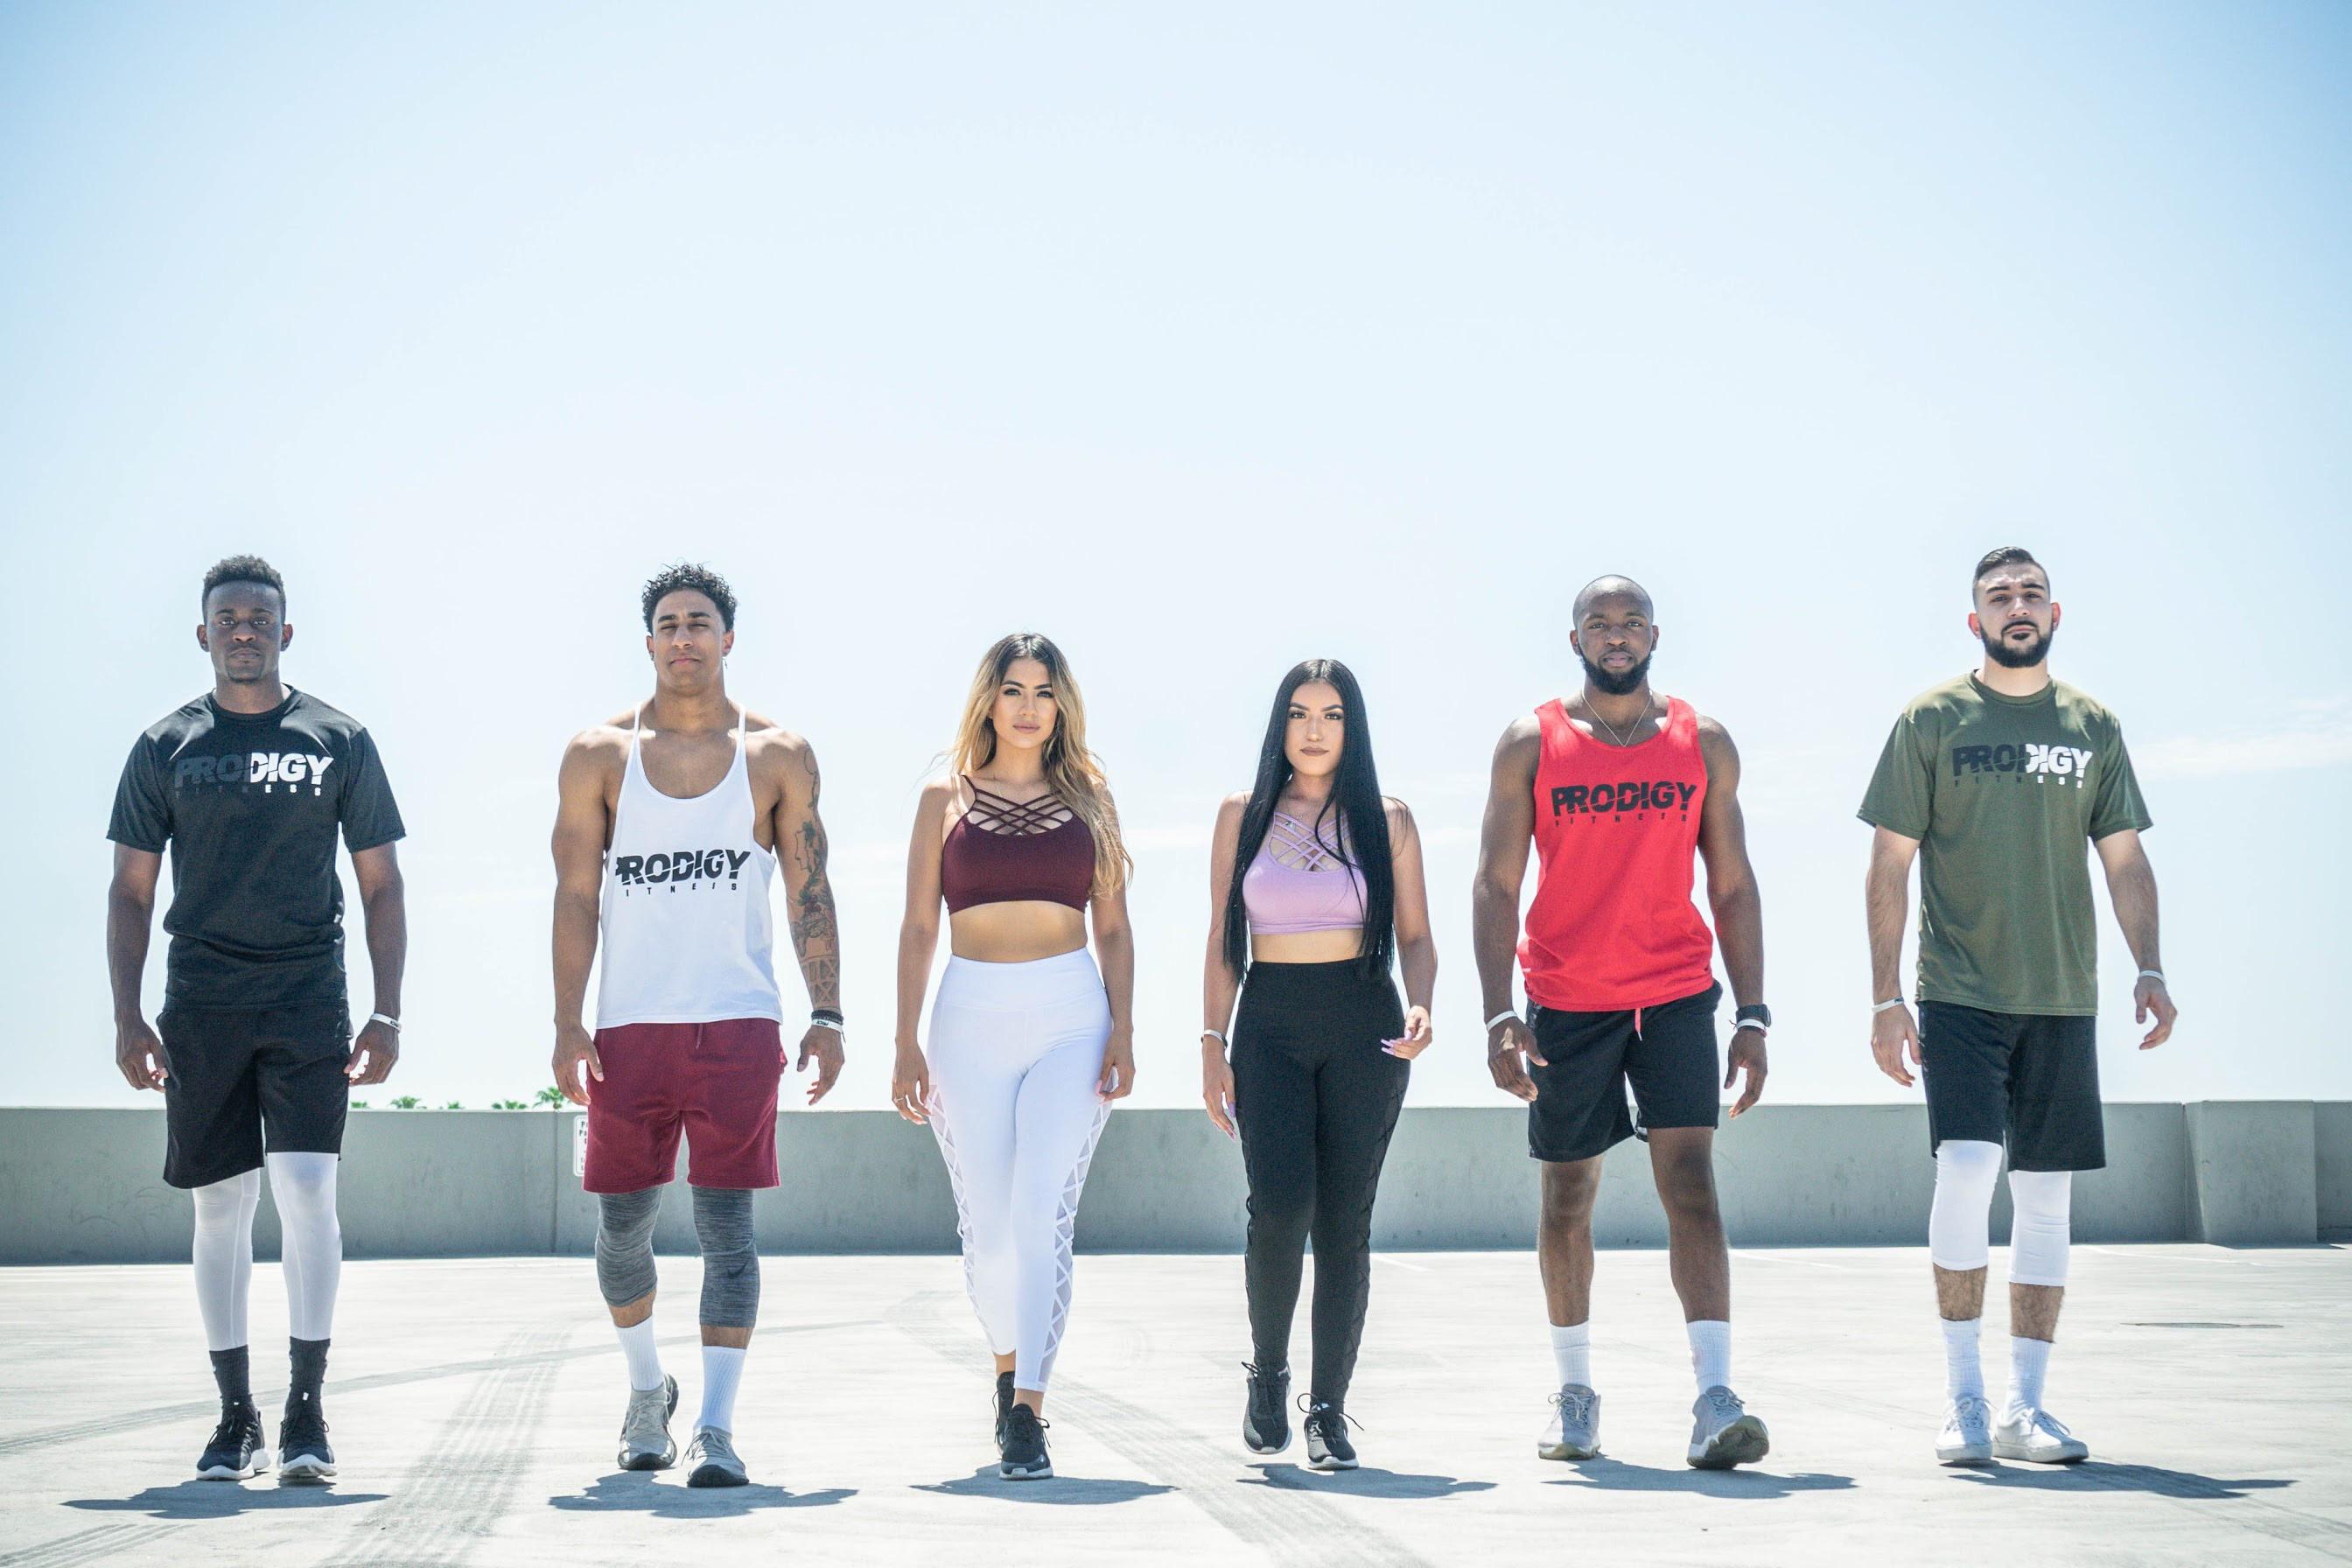 Prodigy Fitness LLC